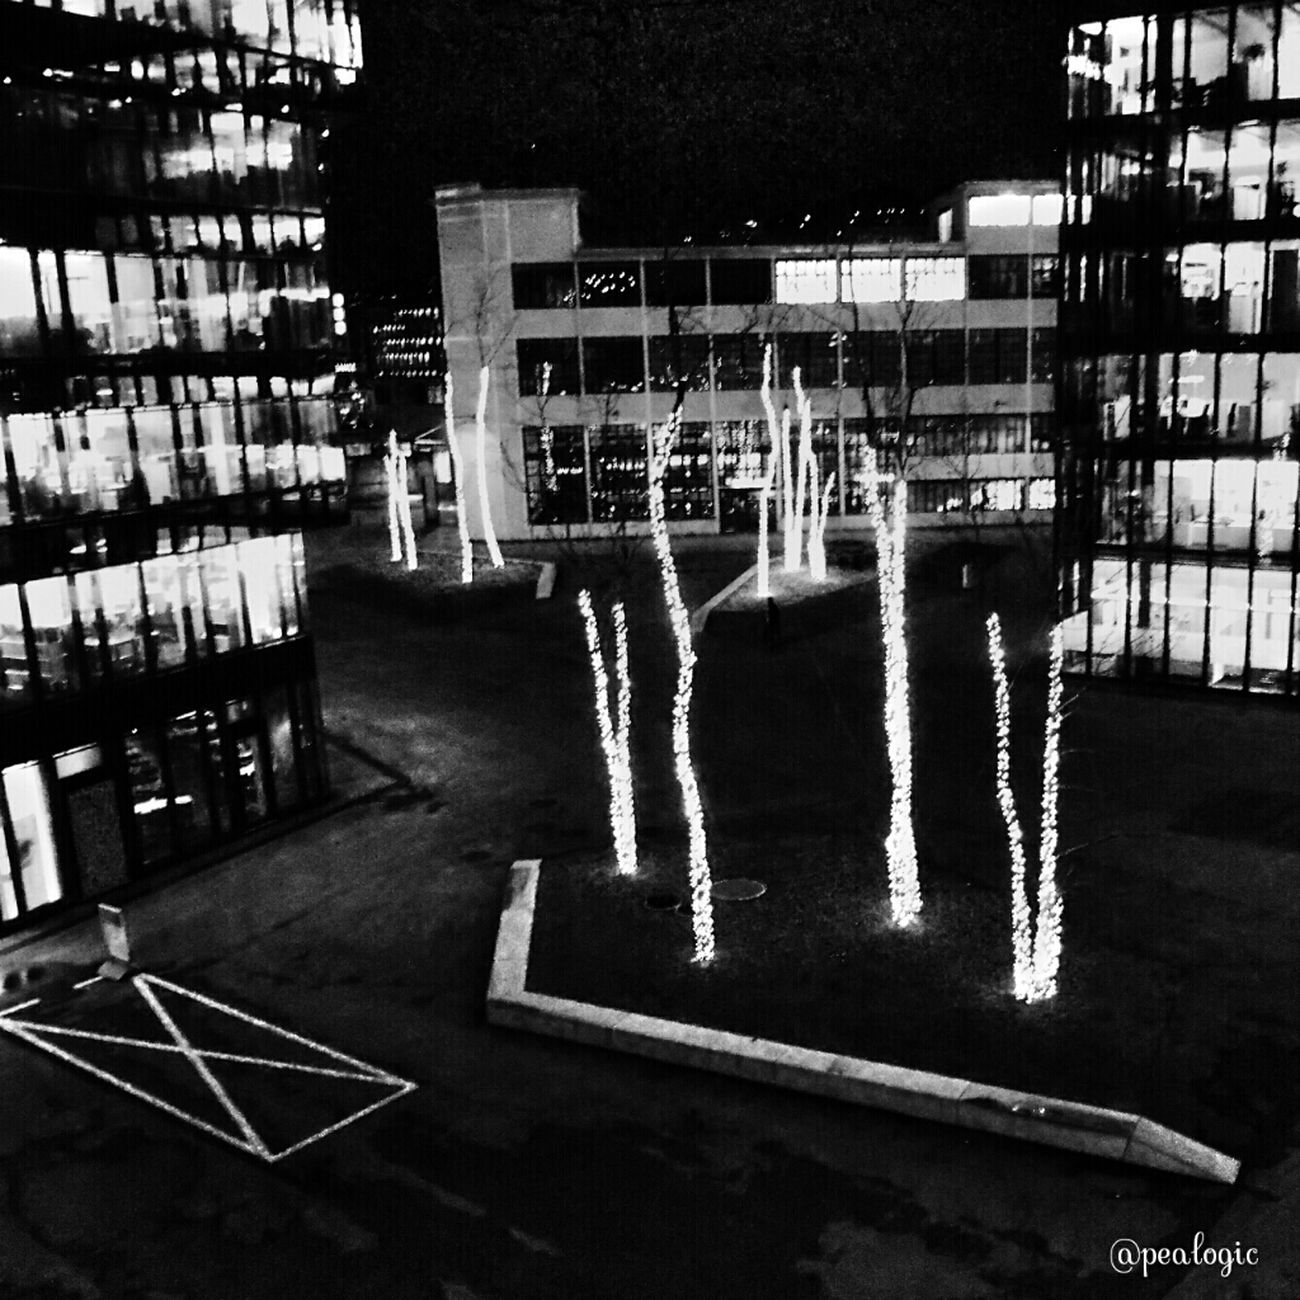 Urban Blackandwhite Night Lights Zürich Switzerland Noir Et Blanc Bws_worldwide Eye4photography  Ee_daily Bwstyles_gf Bwsquare Bws_artist_eu EE_Daily: Black And White Sunday EE_Daily: Black And White